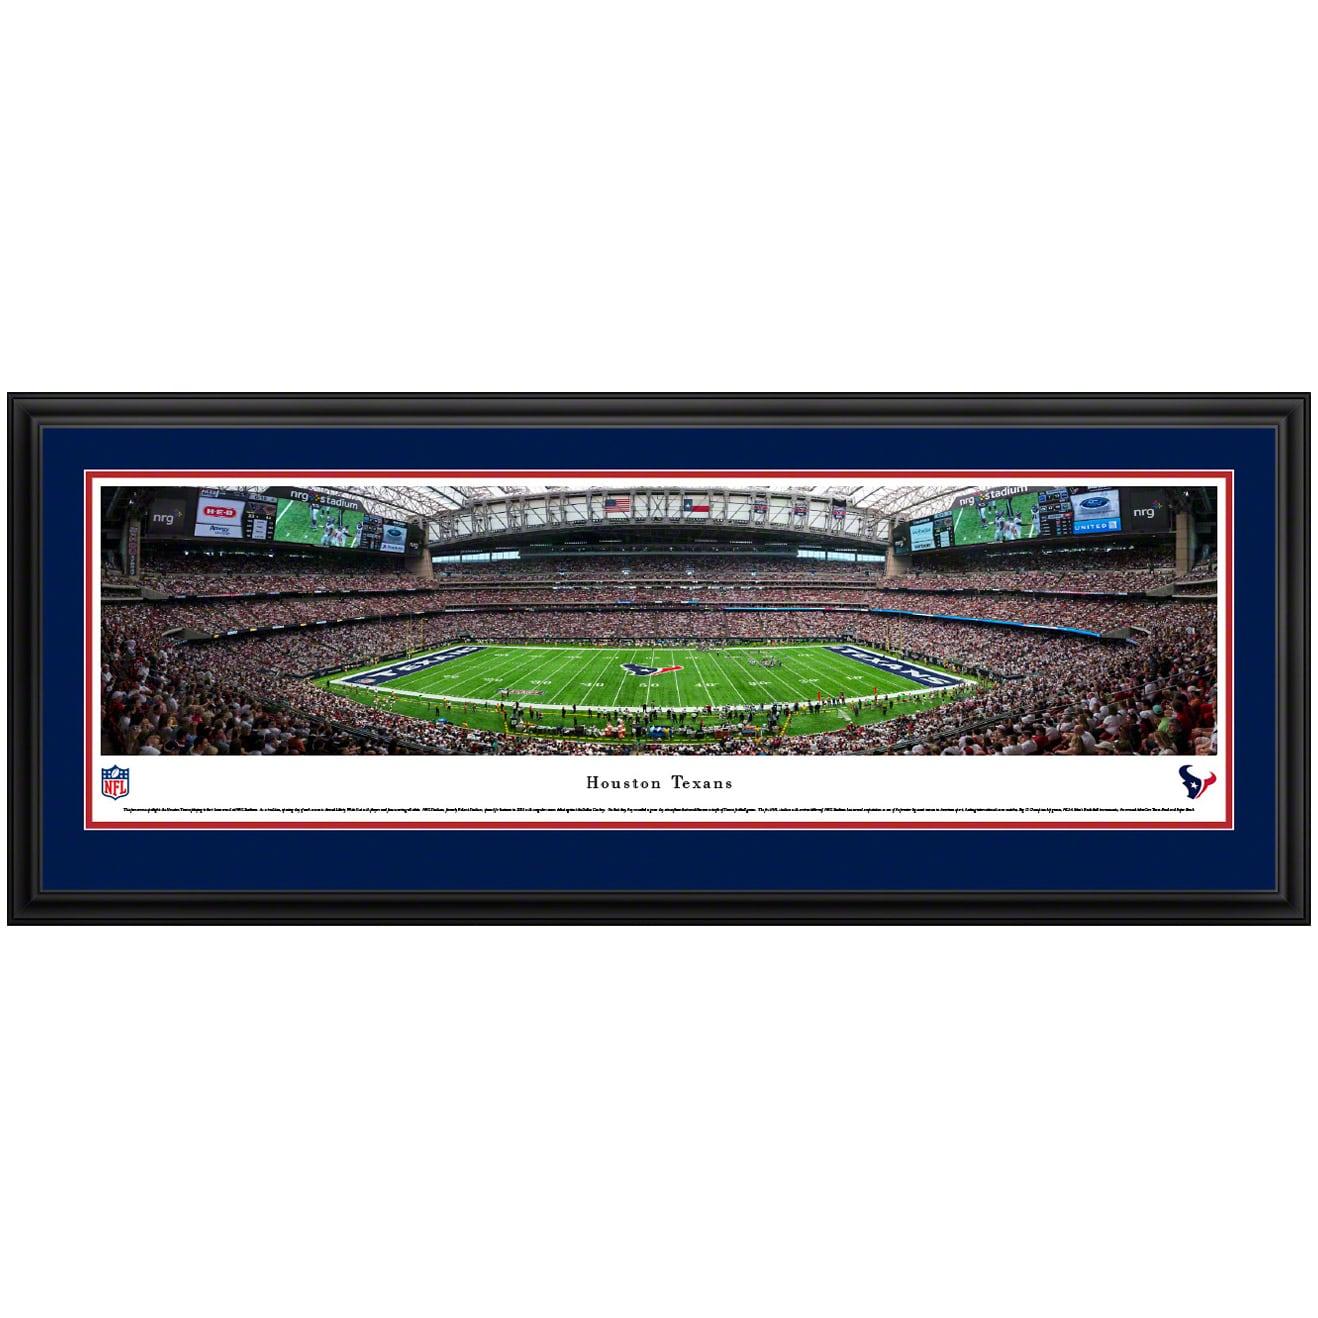 "Houston Texans 44"" x 18"" Deluxe Frame Panoramic Photo"